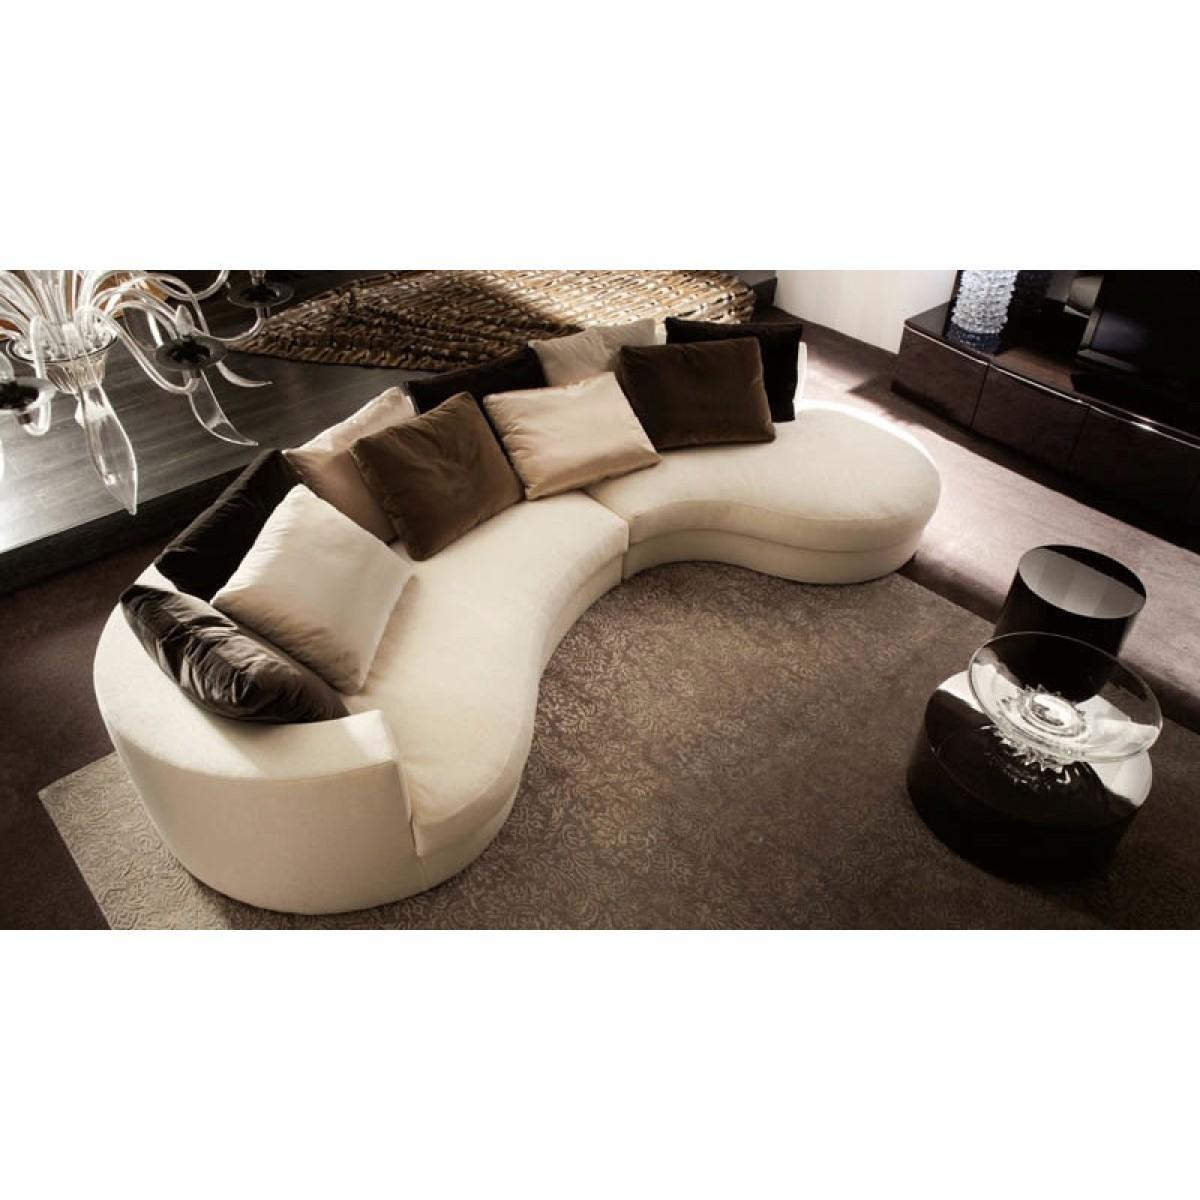 Sofas Center : Stirring Circle Sectional Sofa Photoncept Circular For Semi Sofas (Image 19 of 20)